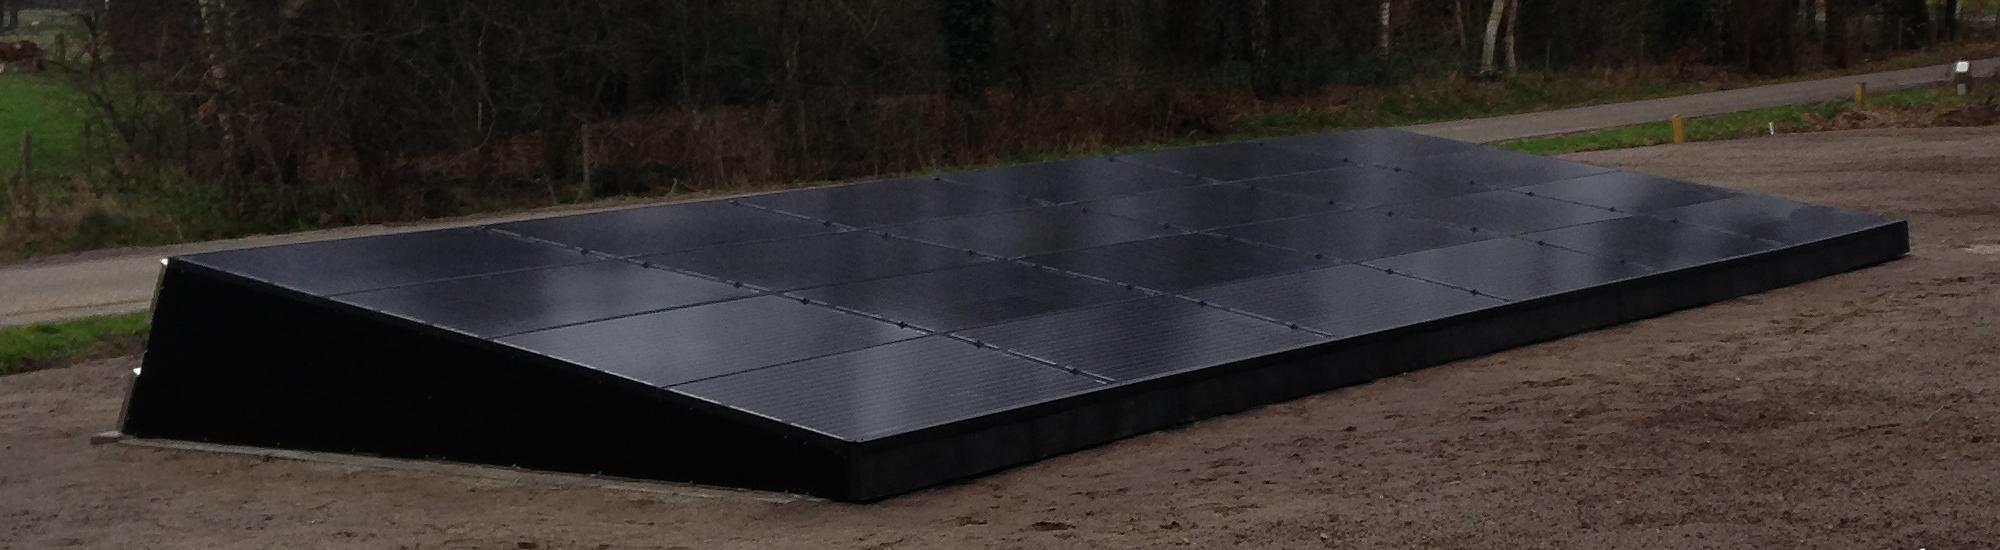 zonnepanelen-systeem